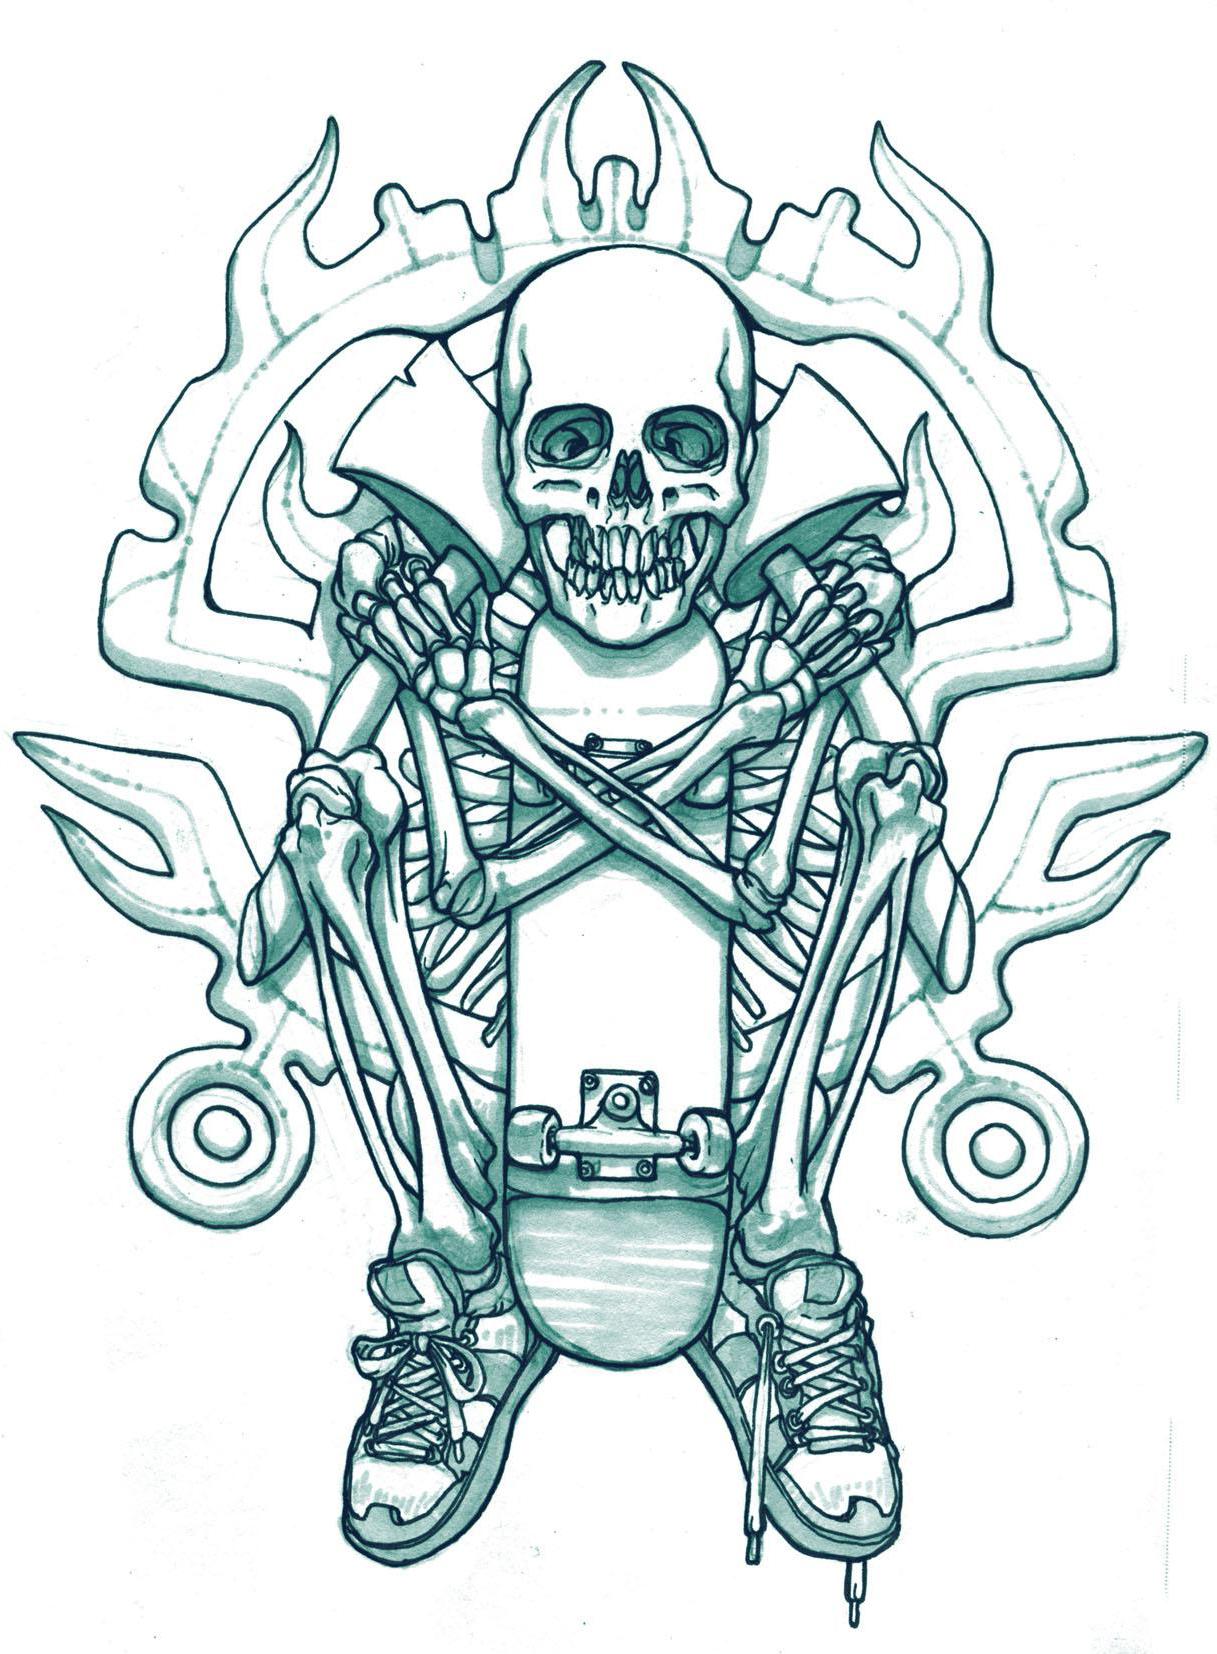 Skateboard Skeleton tattoo sketch